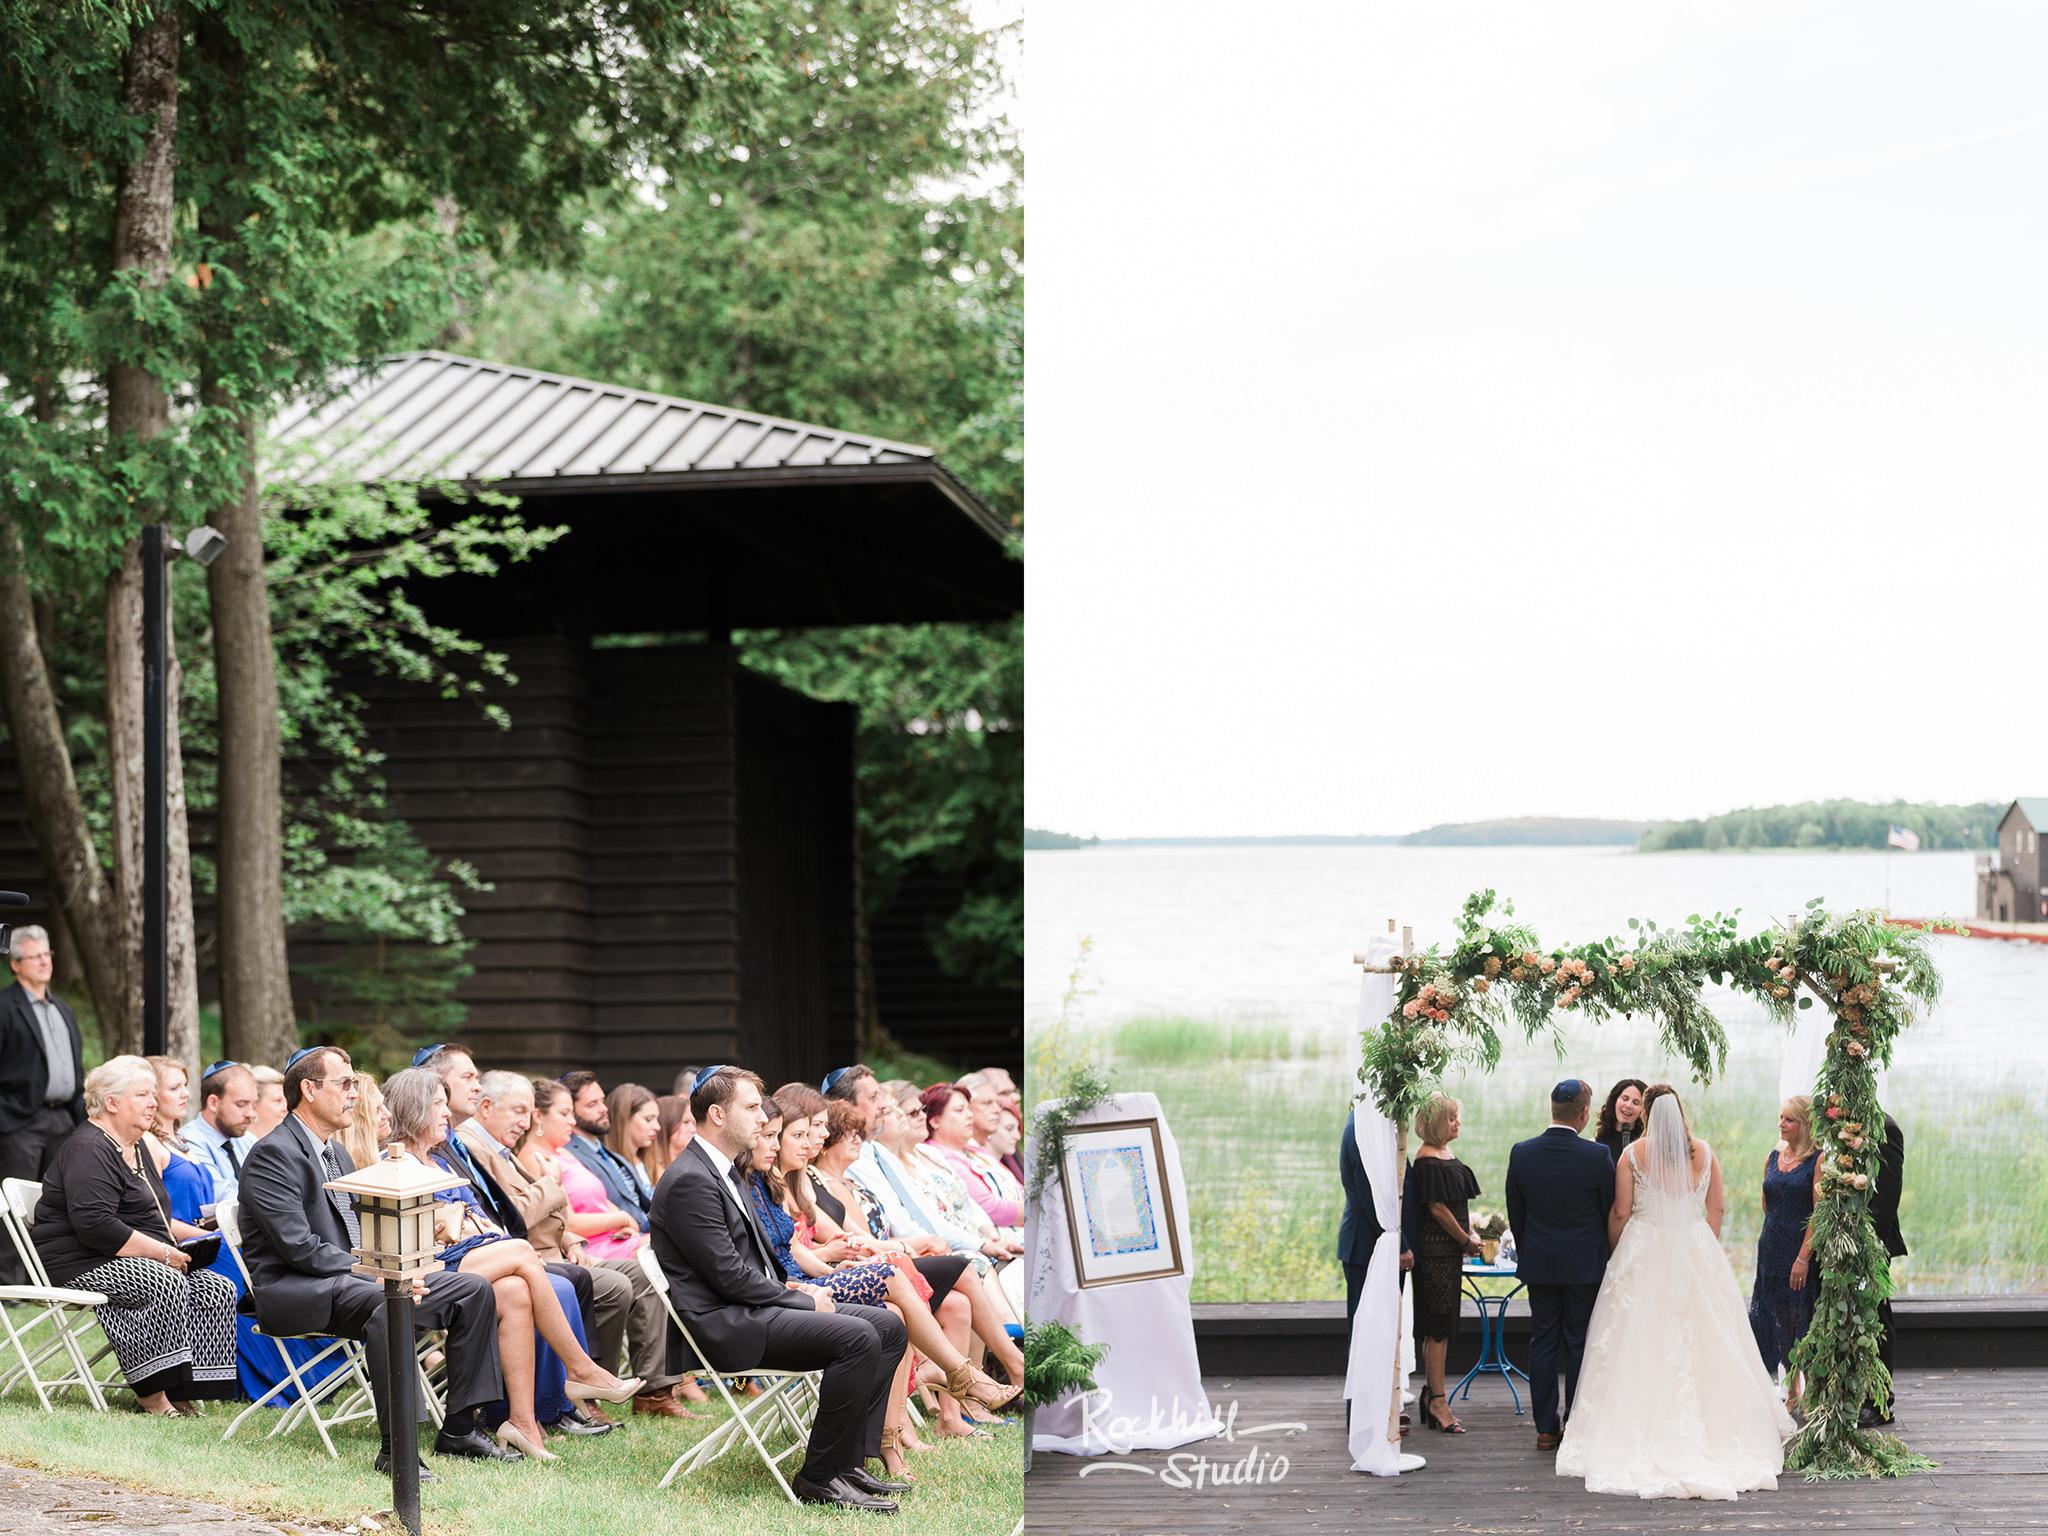 Drummond Island Wedding, Jewish Ceremony, Traverse City Wedding Photographer Rockhill Studio